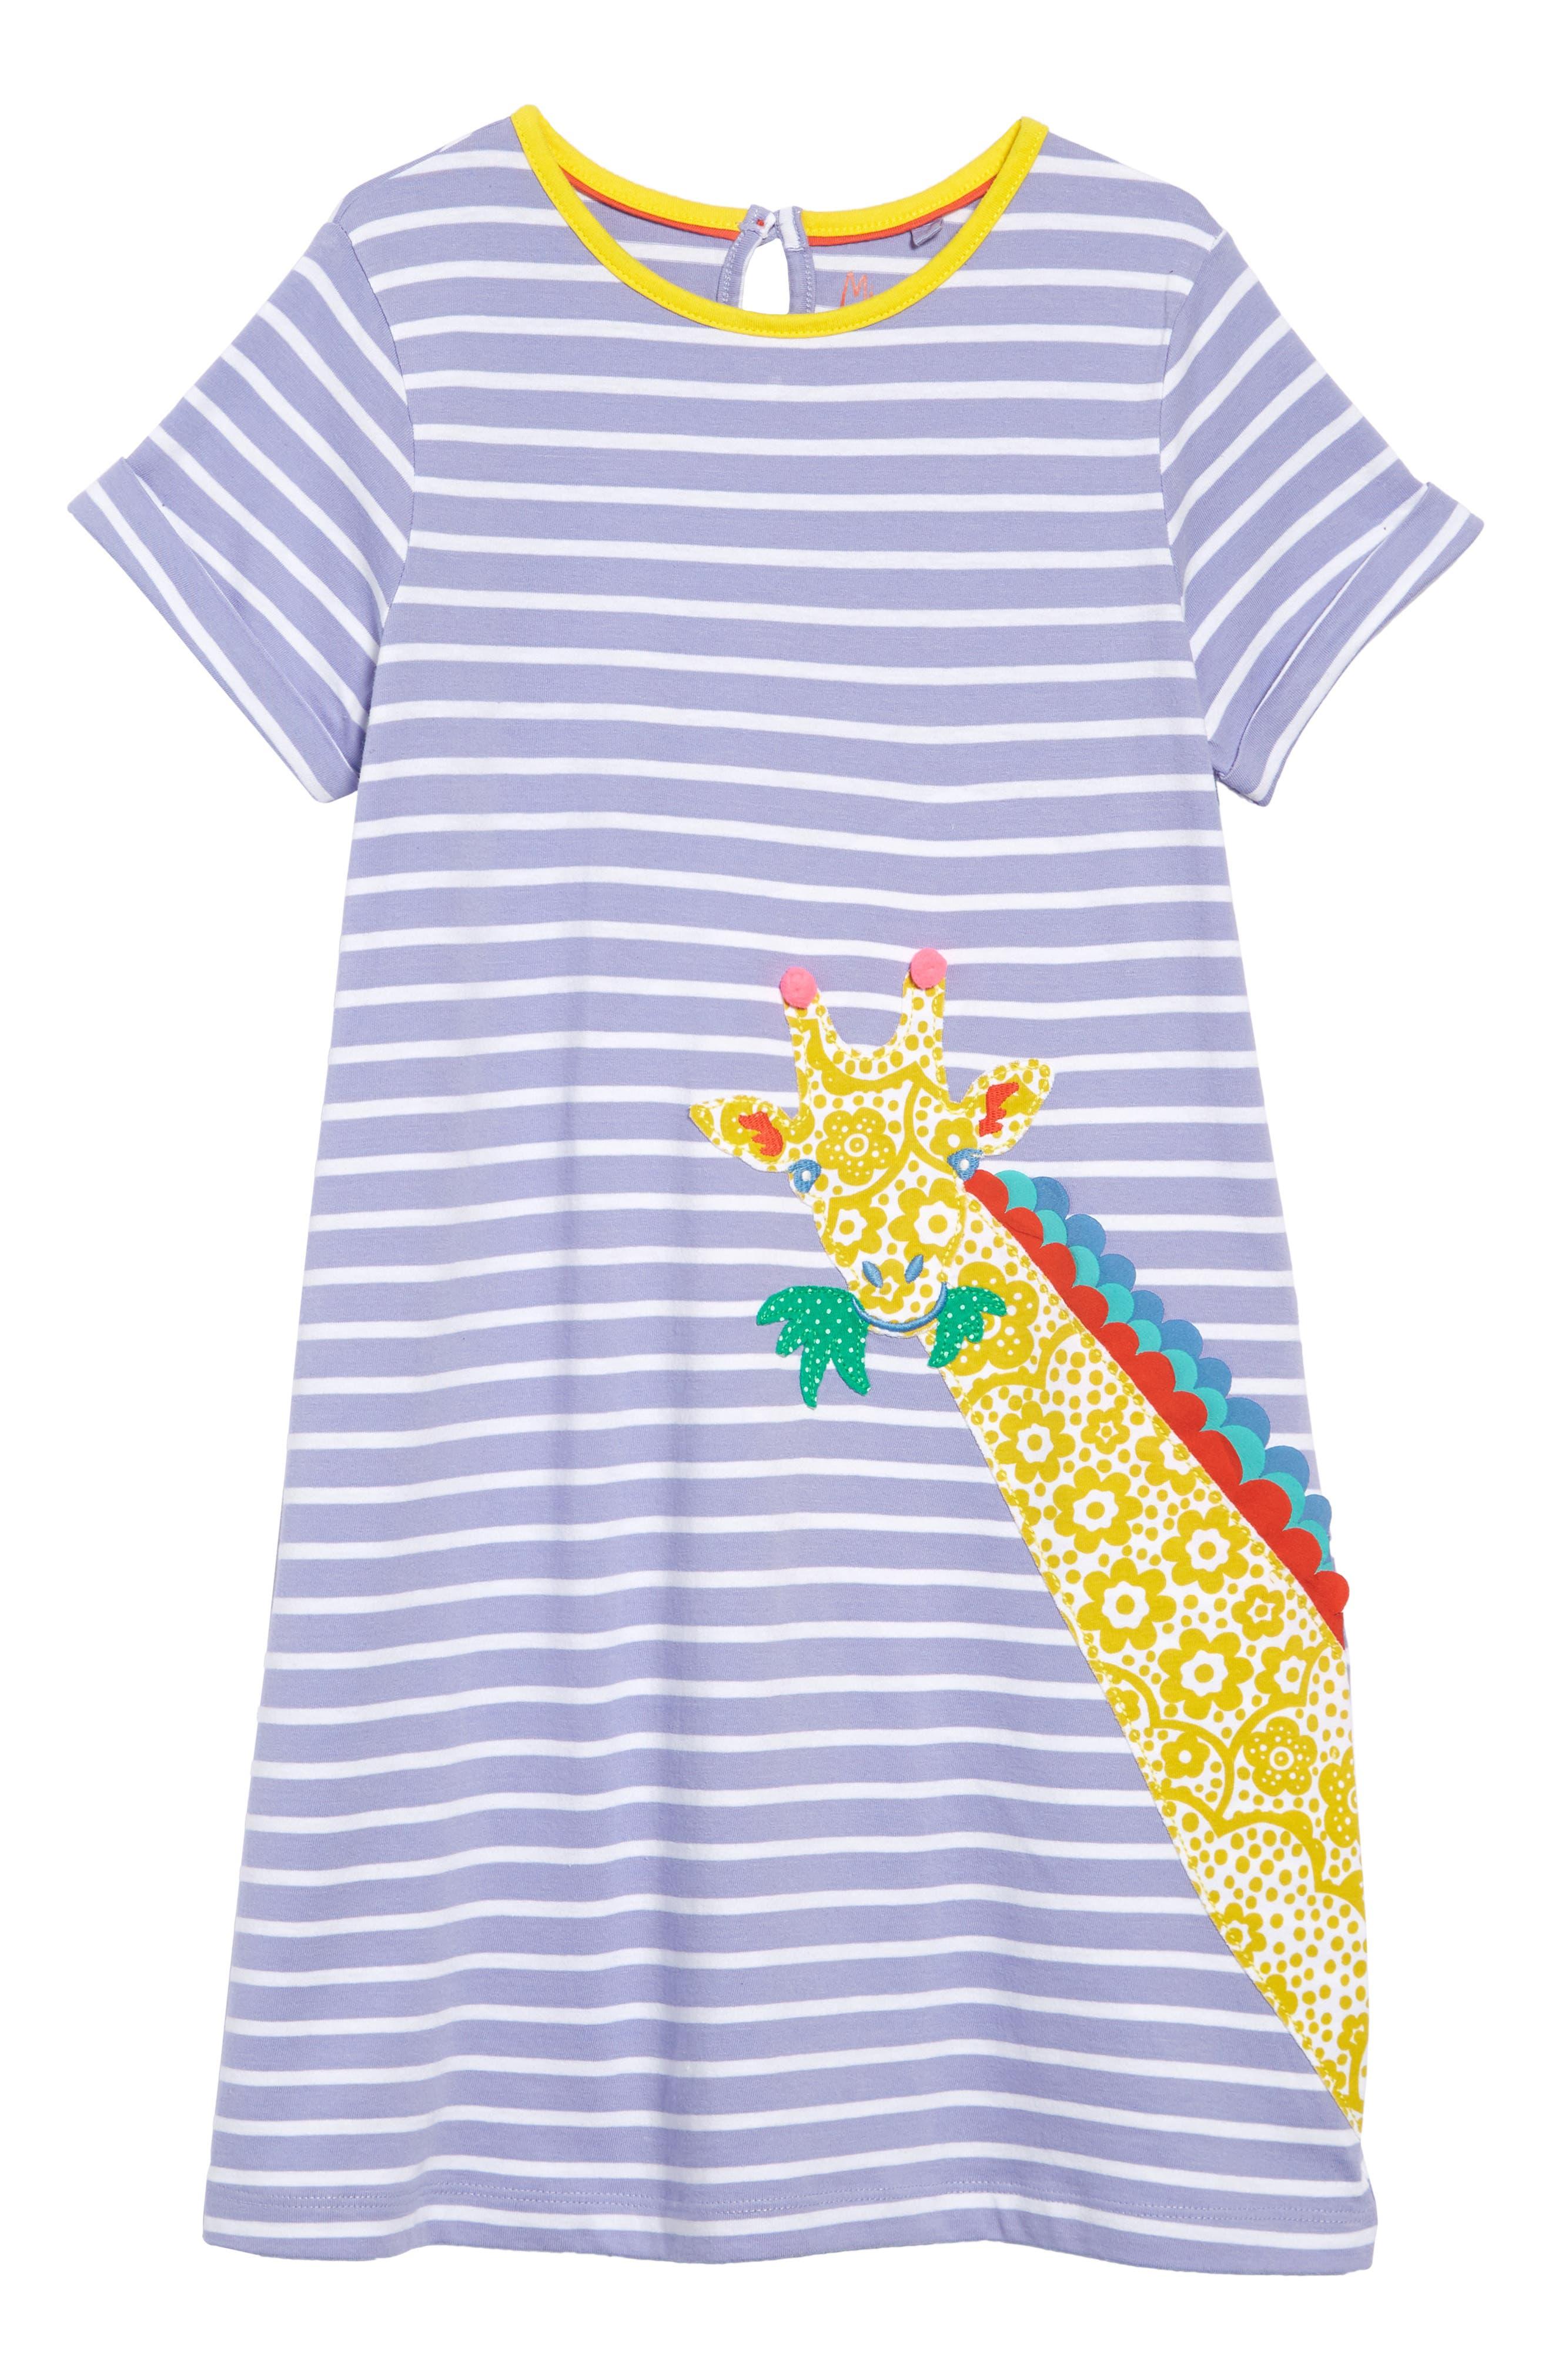 Safari Friend Appliqué Dress, Main, color, PARMA VIOLET STRIPE/ GIRAFFE